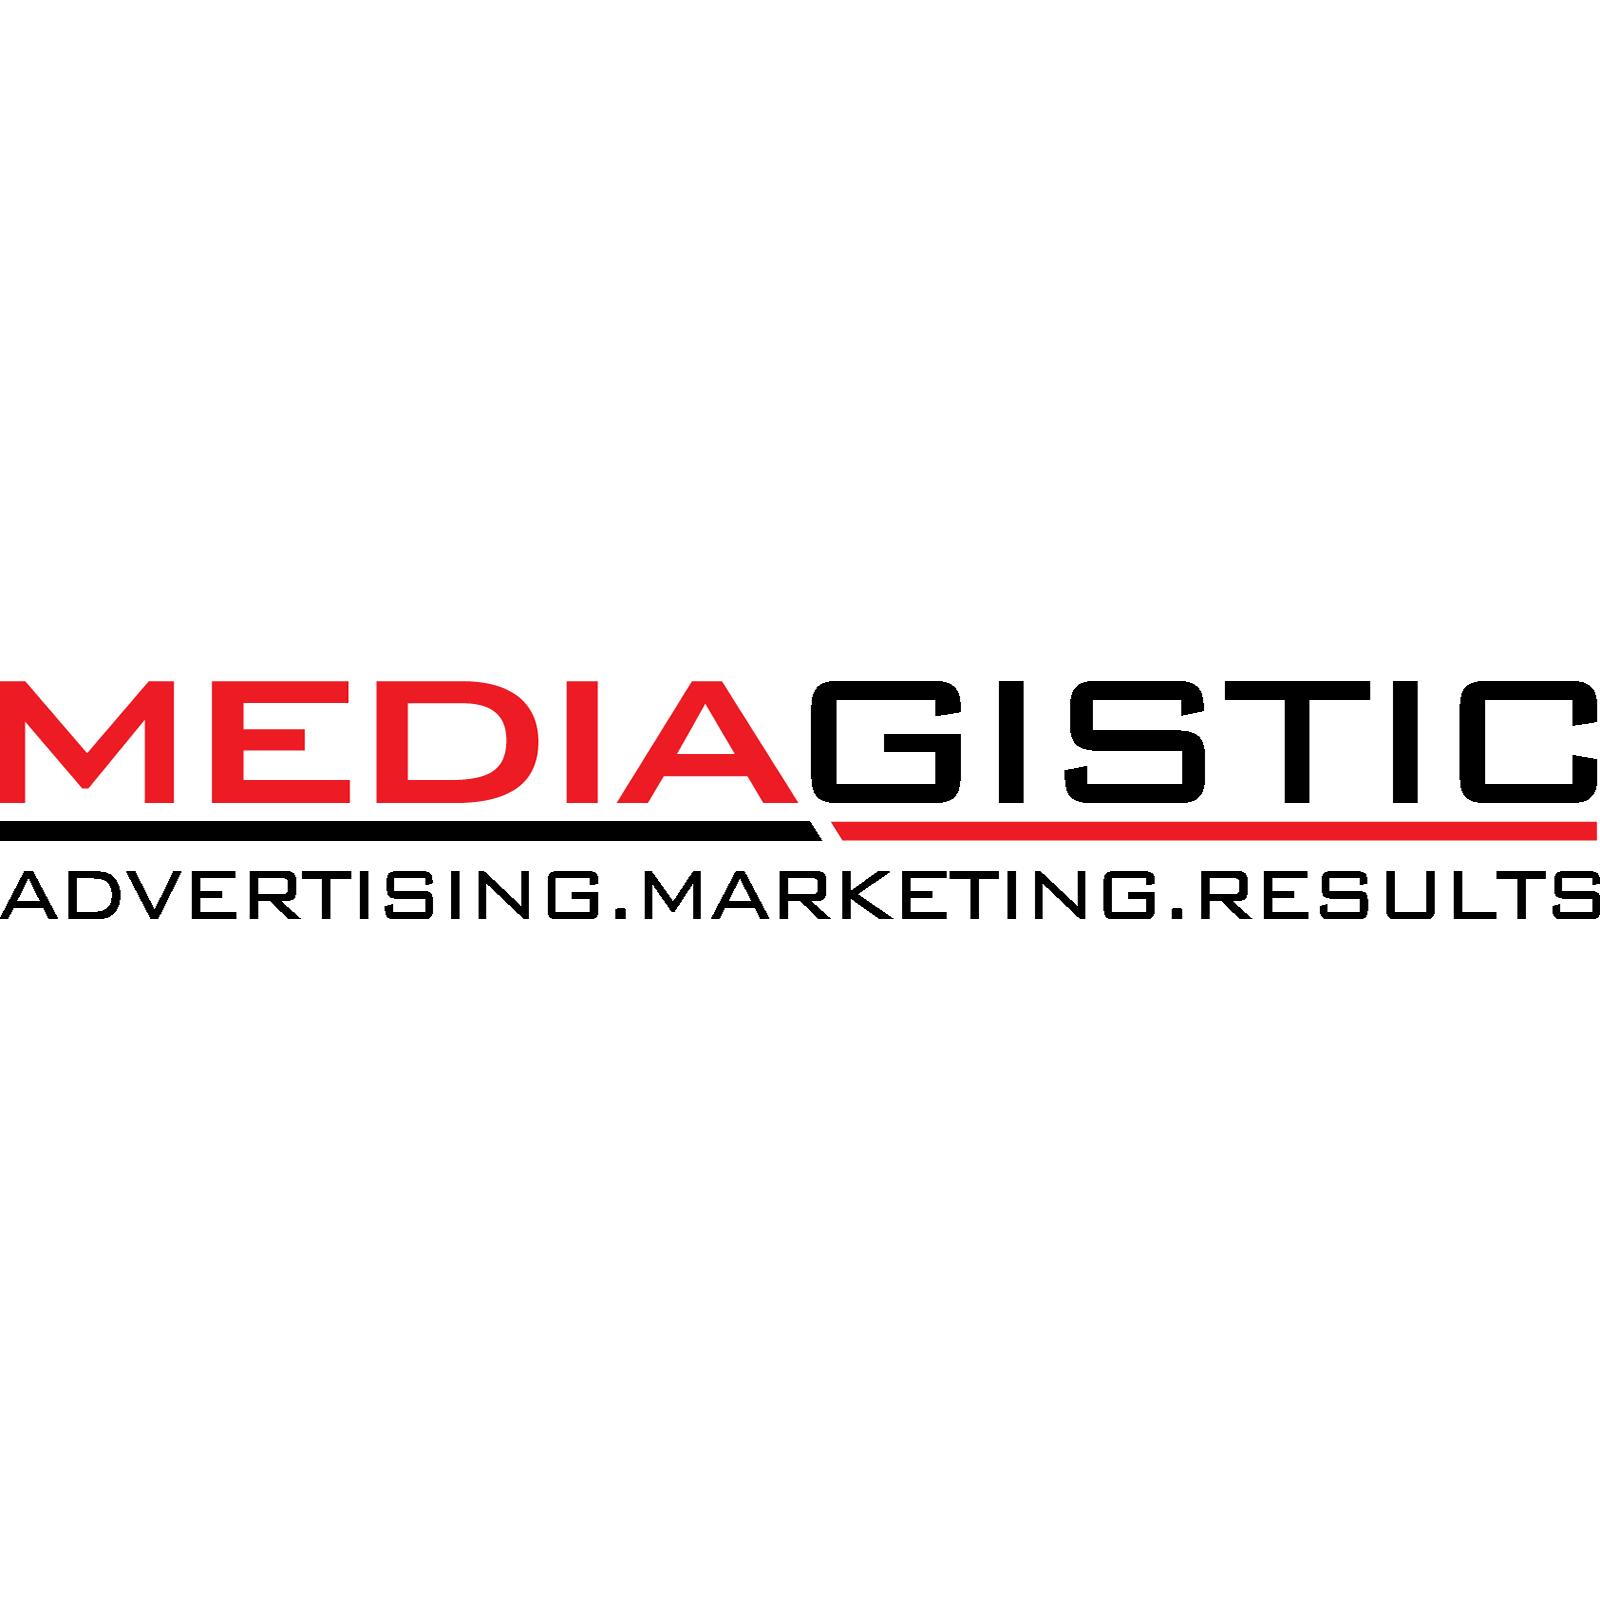 Mediagistic